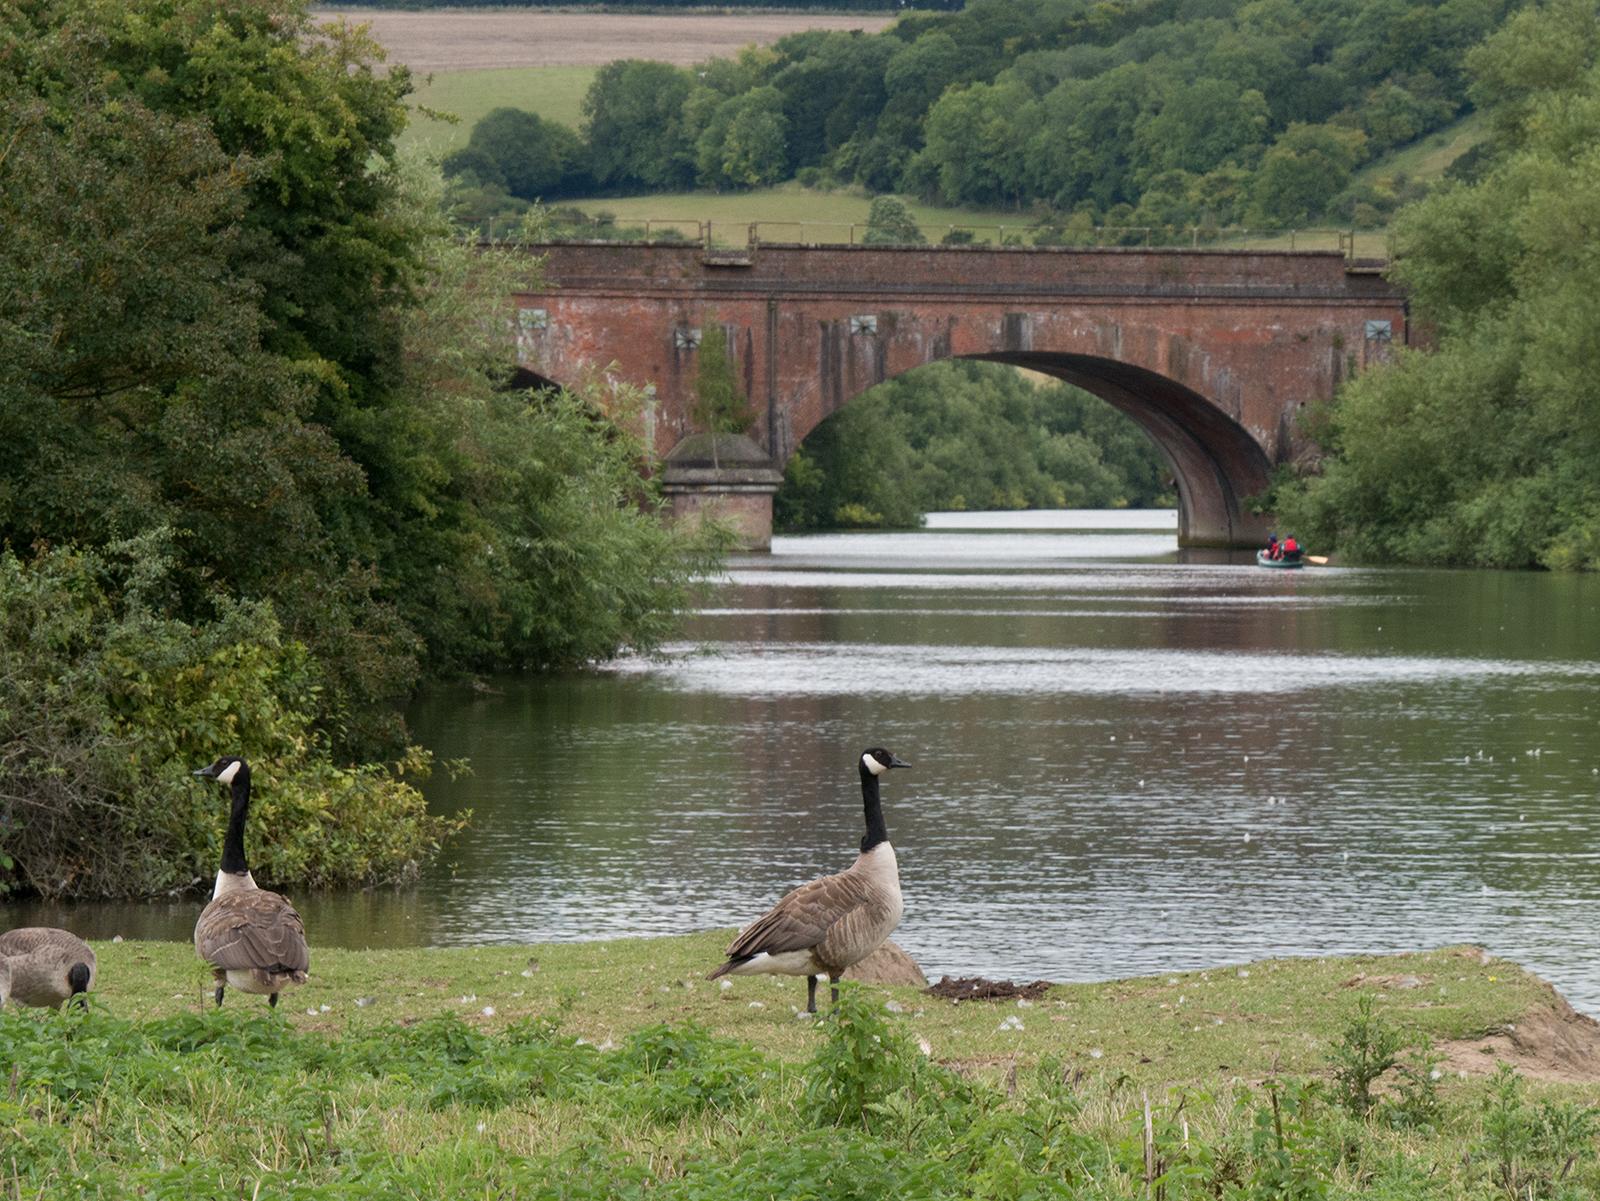 Looking back to the railway bridge